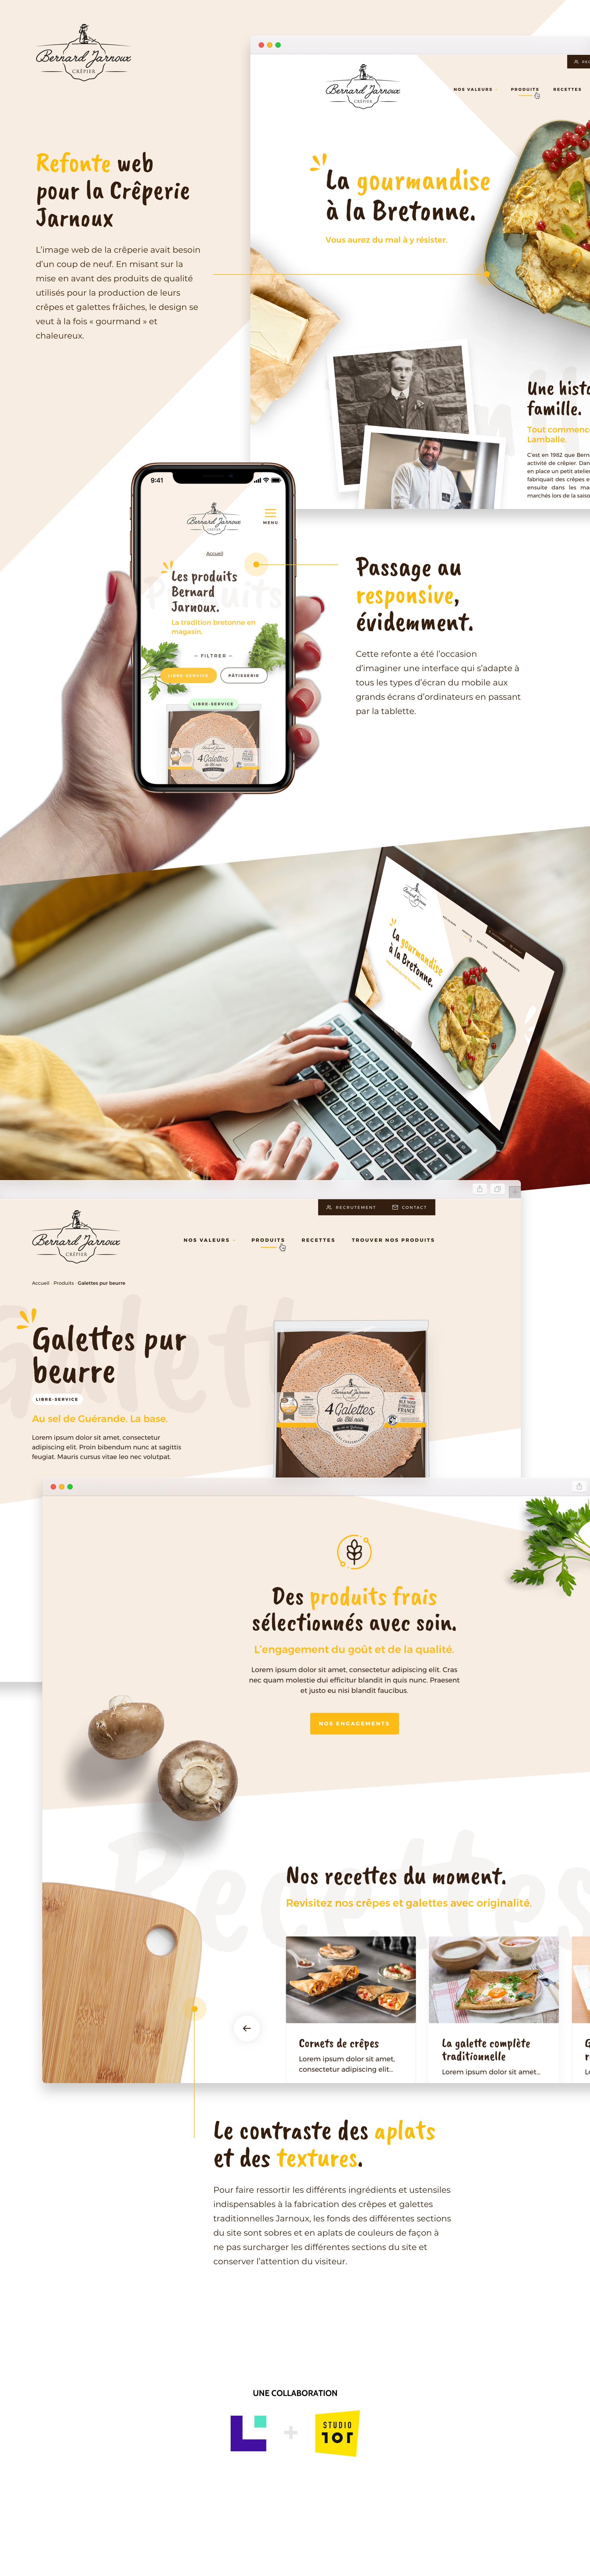 Infographie - refonte webdesign Crêperie Bernard Jarnoux